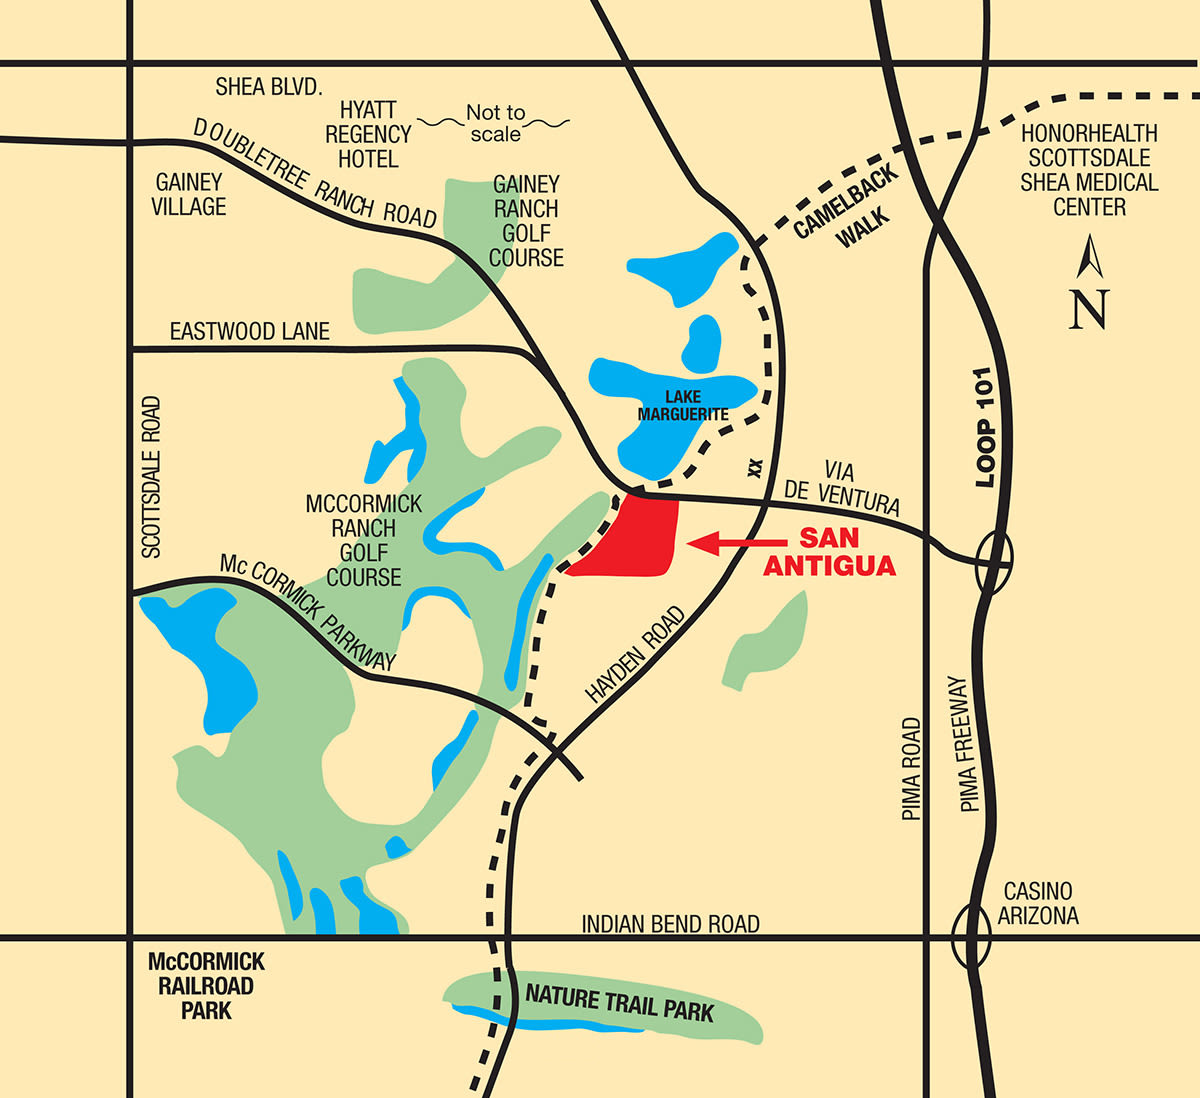 Map of San Antigua in McCormick Ranch